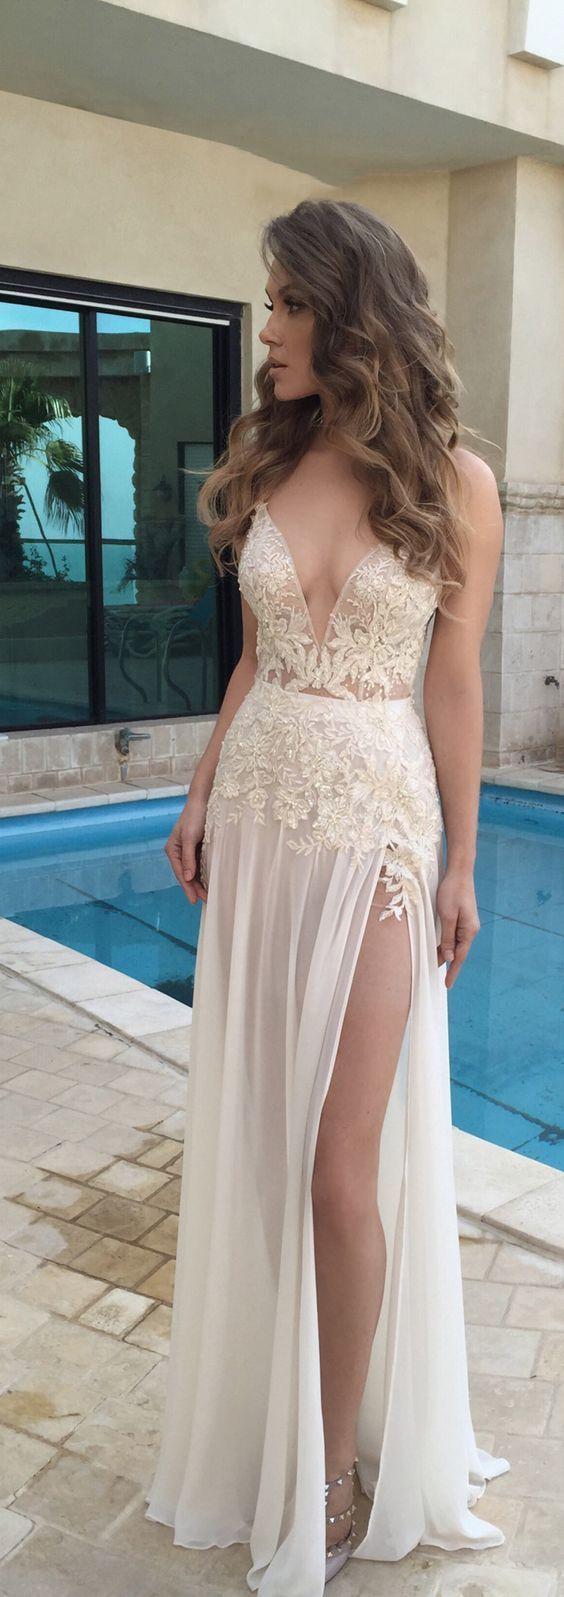 deep v-neck long prom dress applique sleeveless evening dress with high slit,HS268 #EveningDresses #homecomingdresses